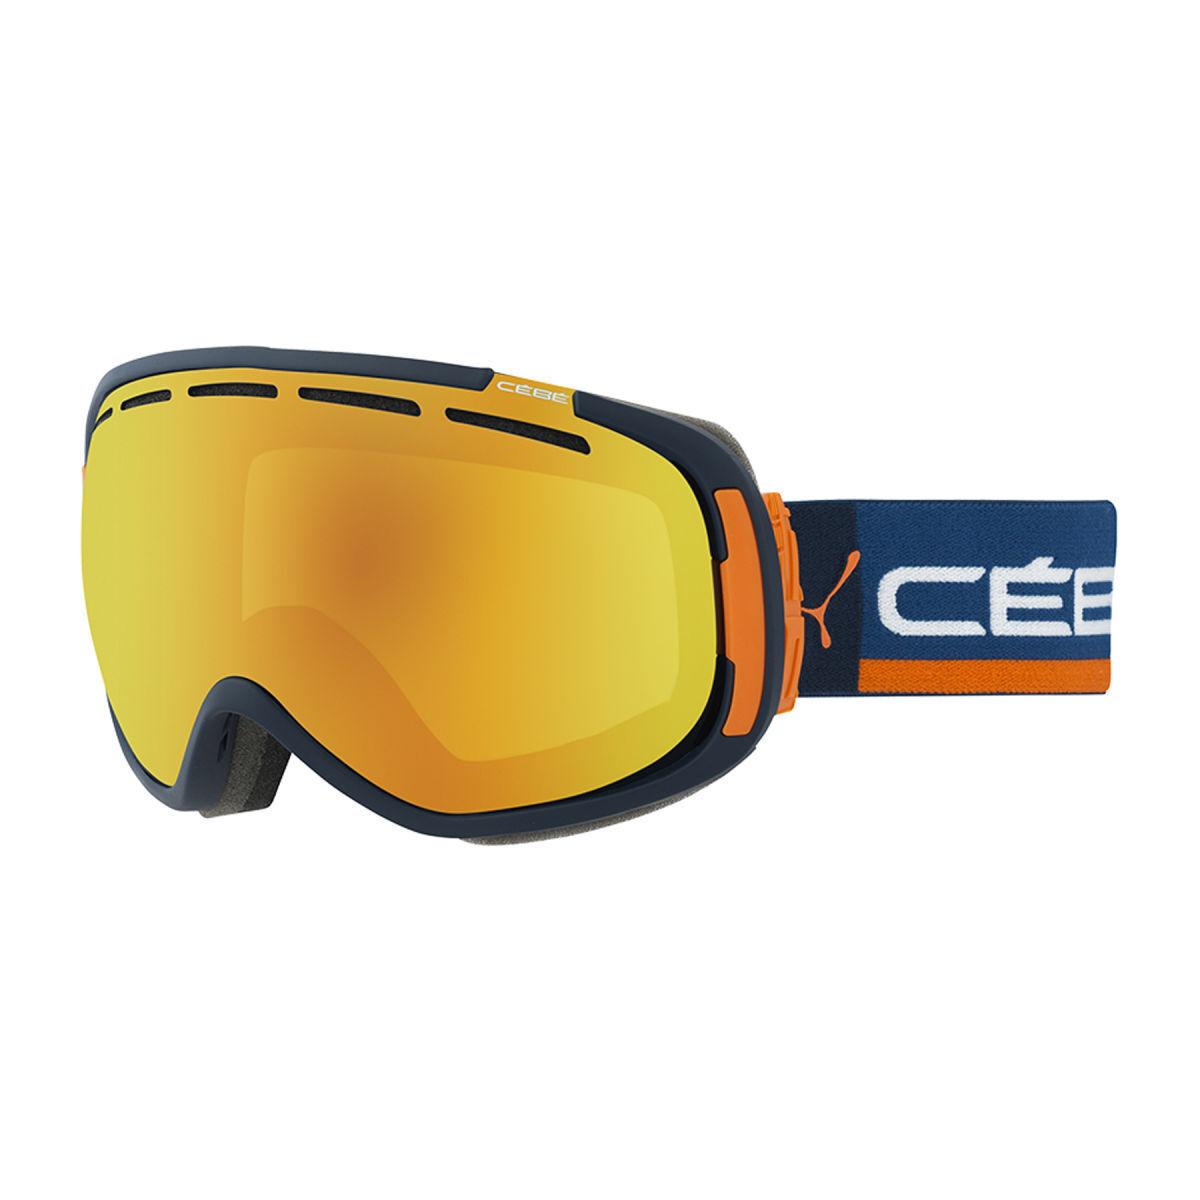 Cebe Feel'in Ski Goggles Cat 2 orange Fire Mirror Lens Unisex CBG123